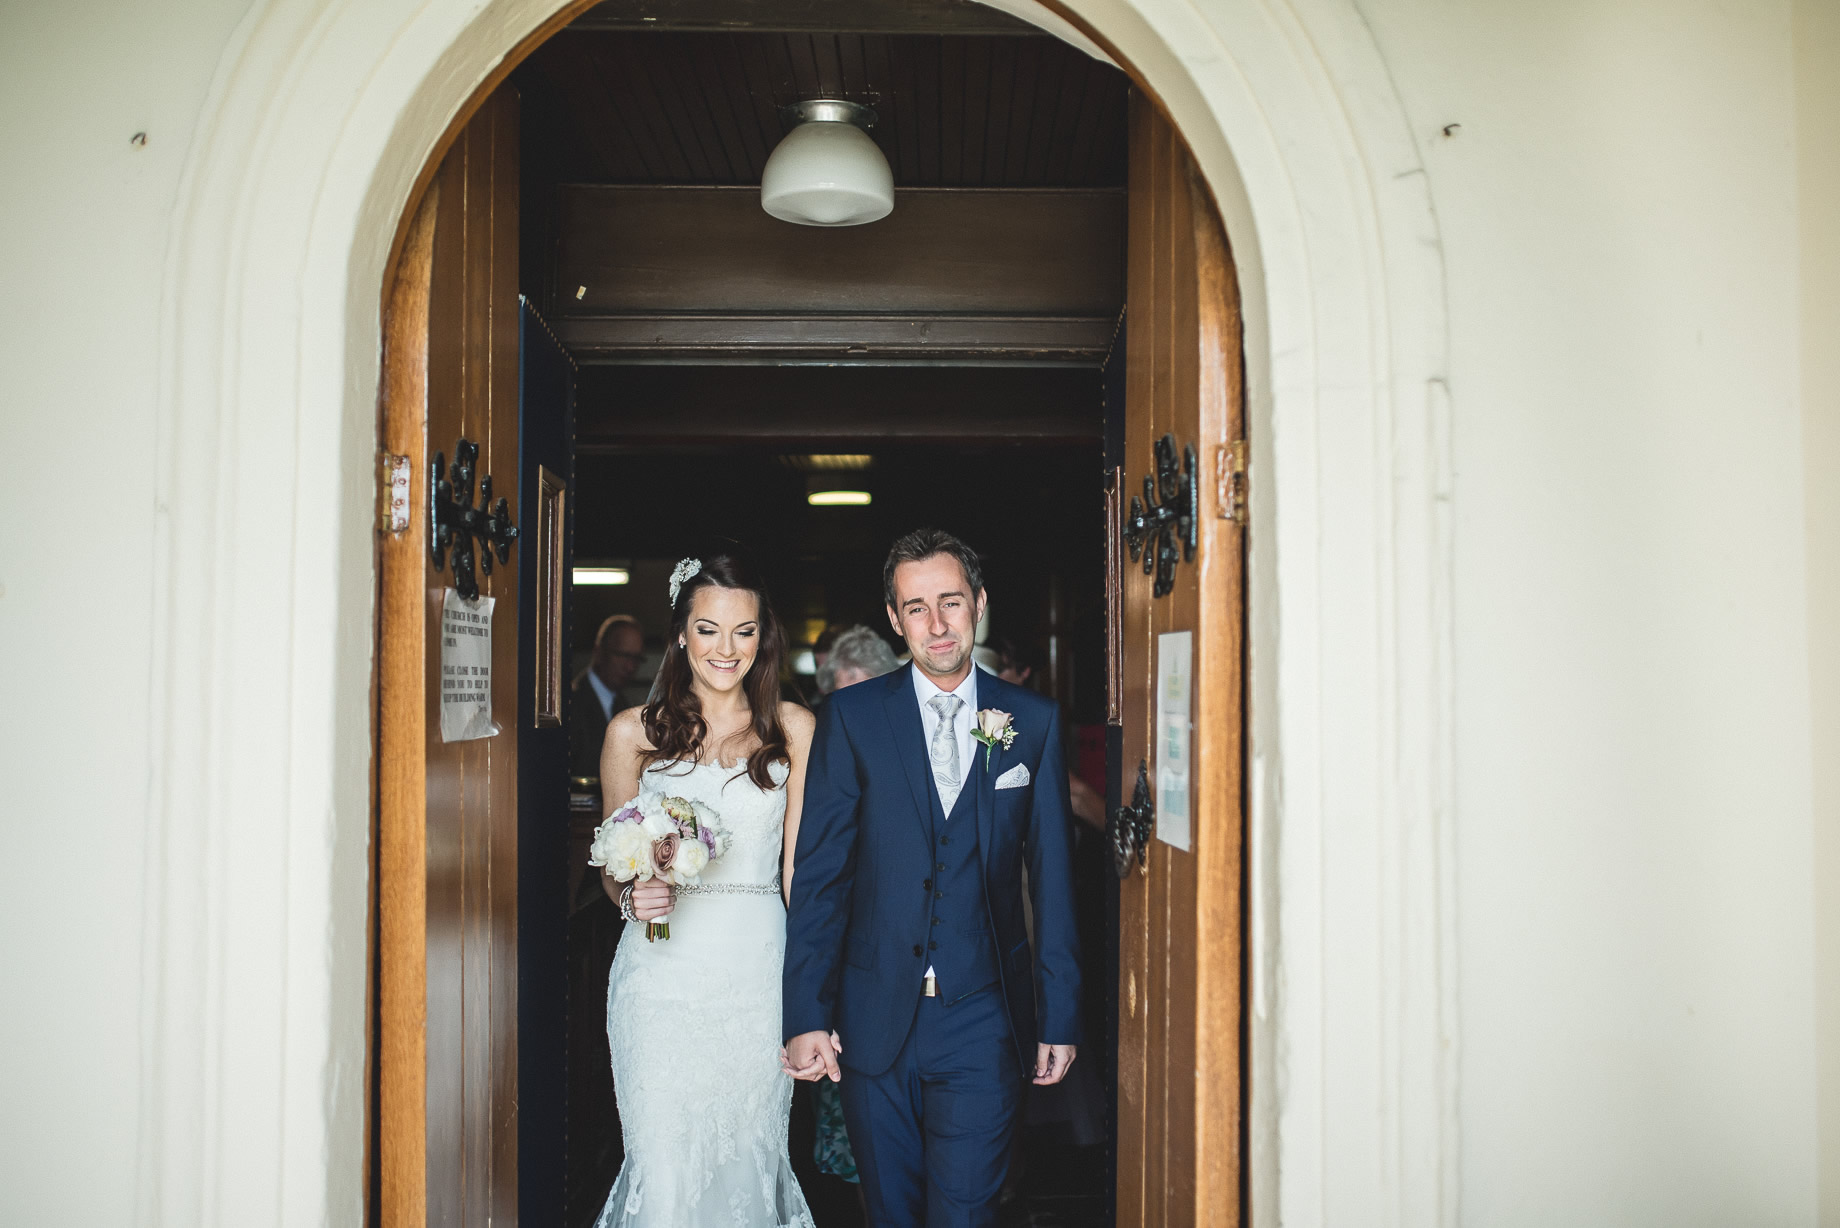 Helen and Matt's Wedding at Mitton Hall 047